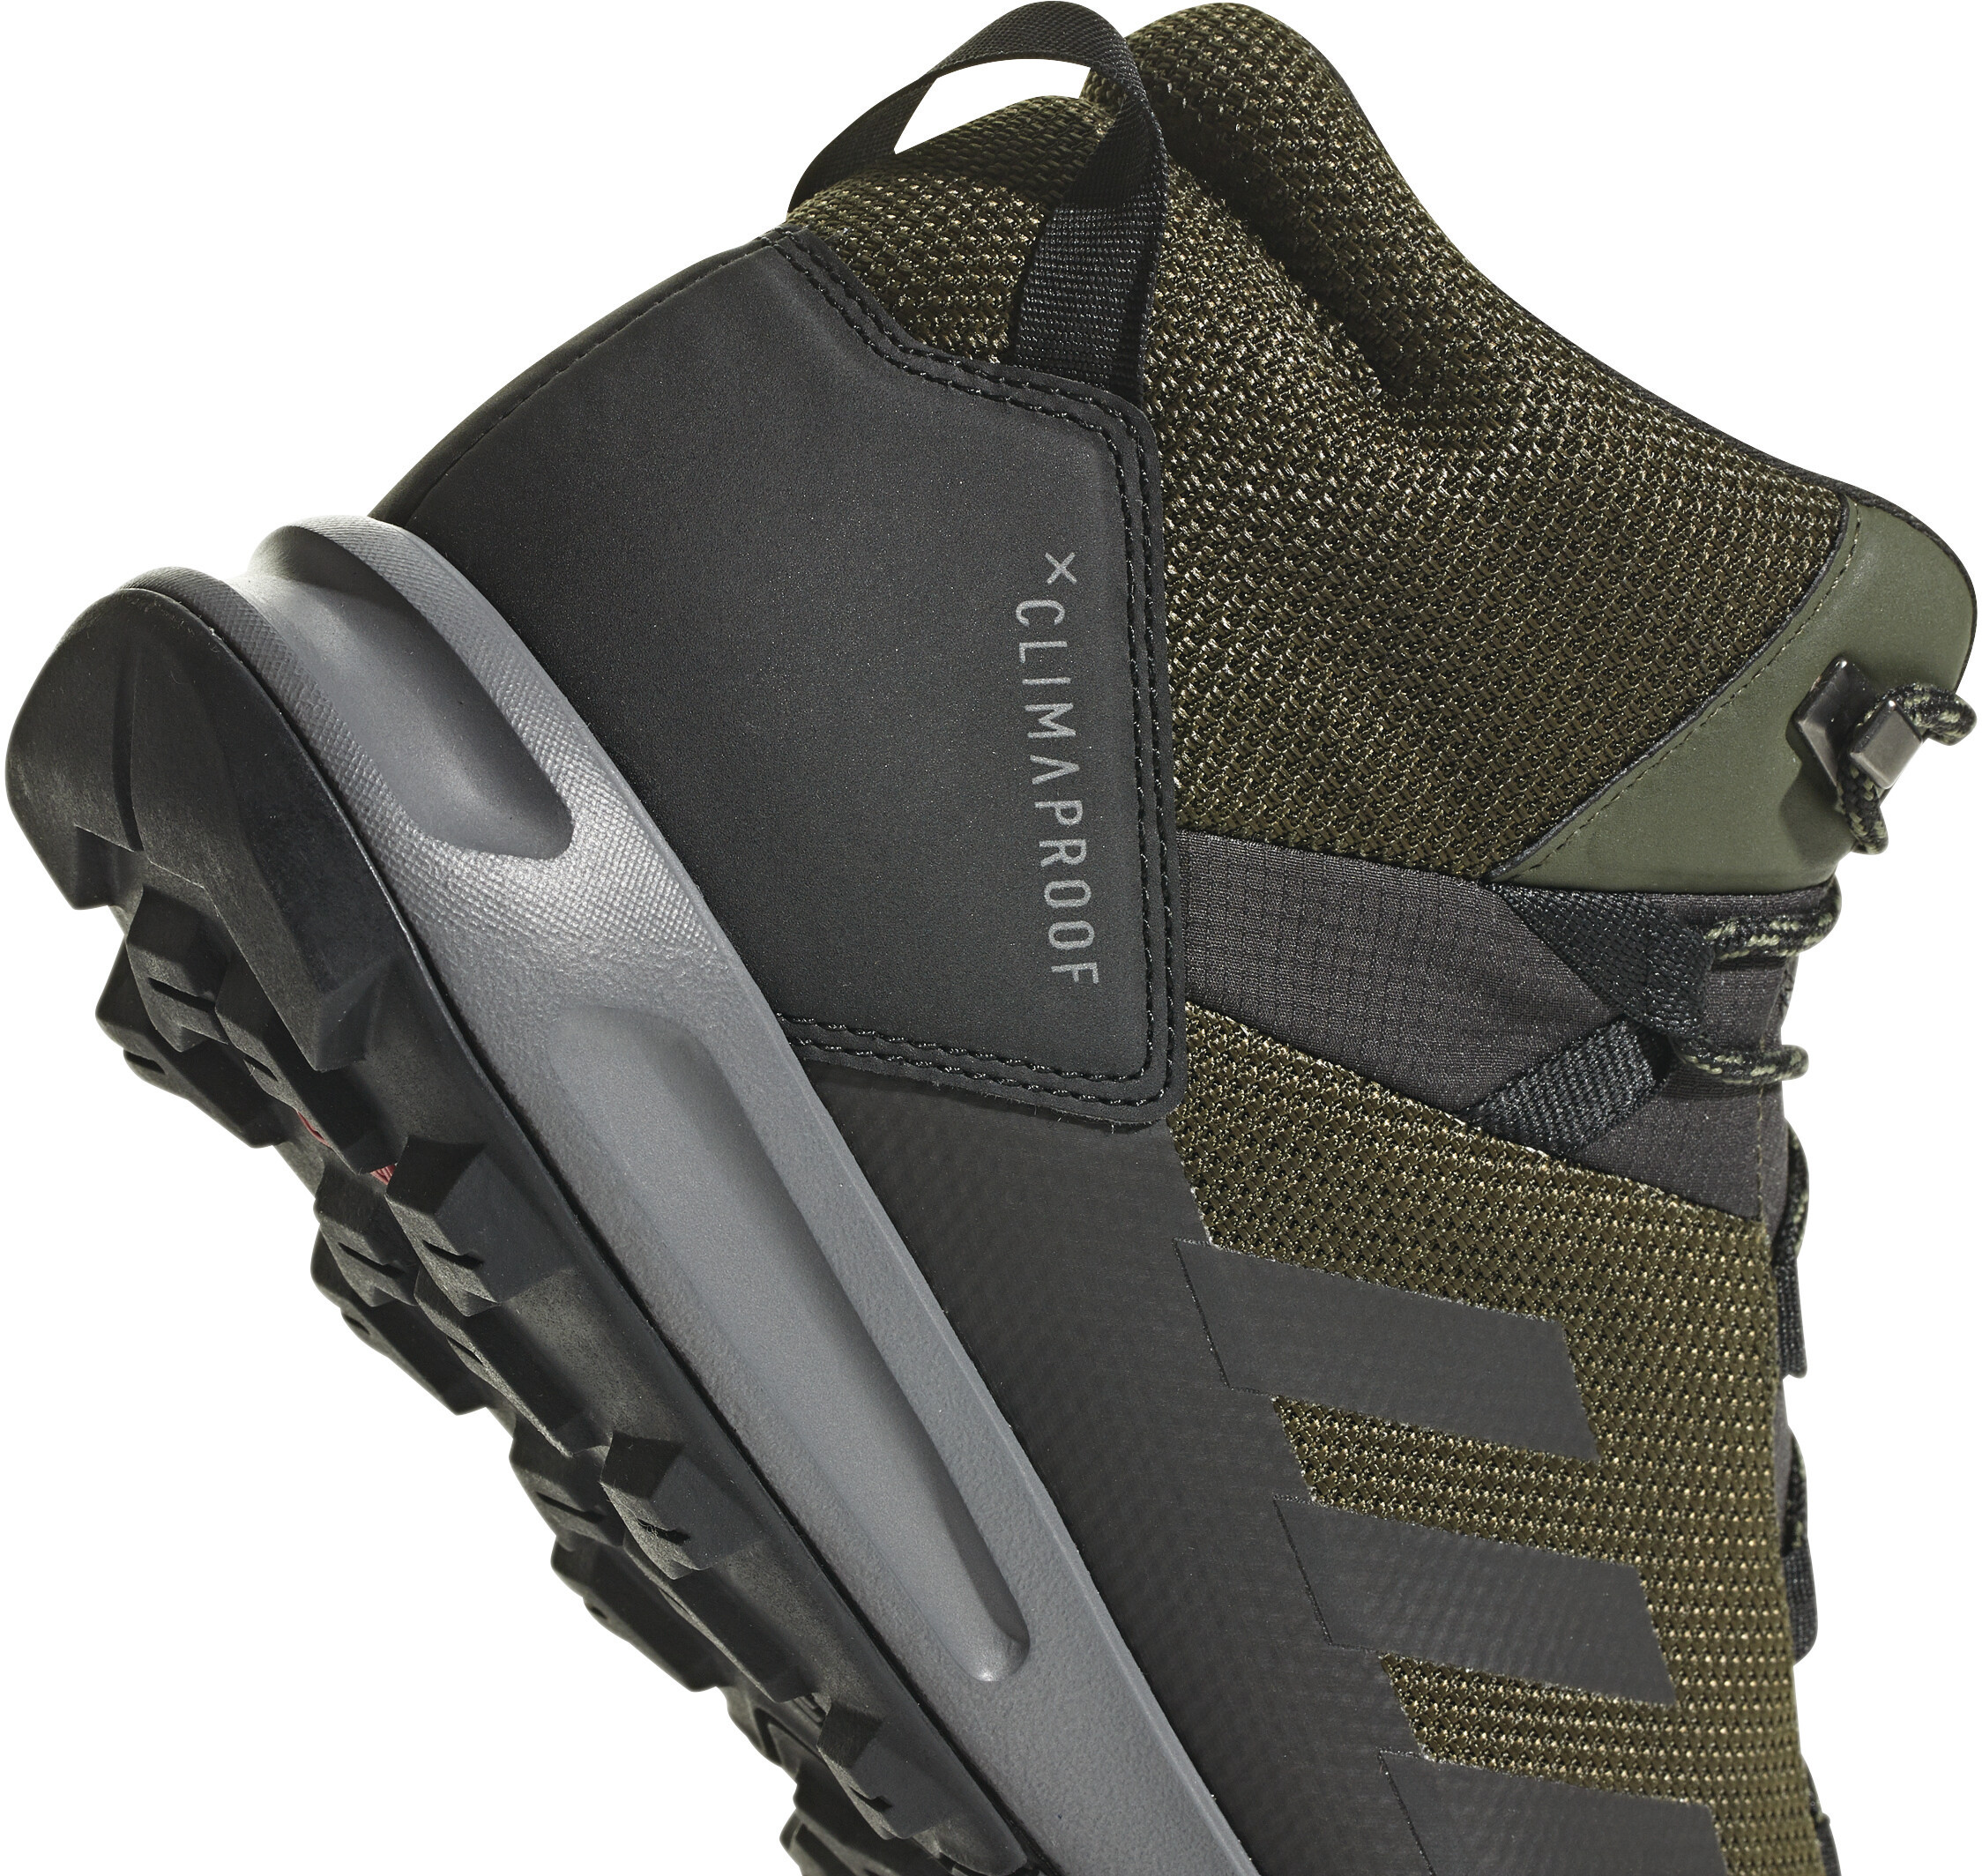 686aaf2a675 adidas TERREX Tivid ClimaProof Outdoor Mid-Shoes Men night cargo/core  black/grey four